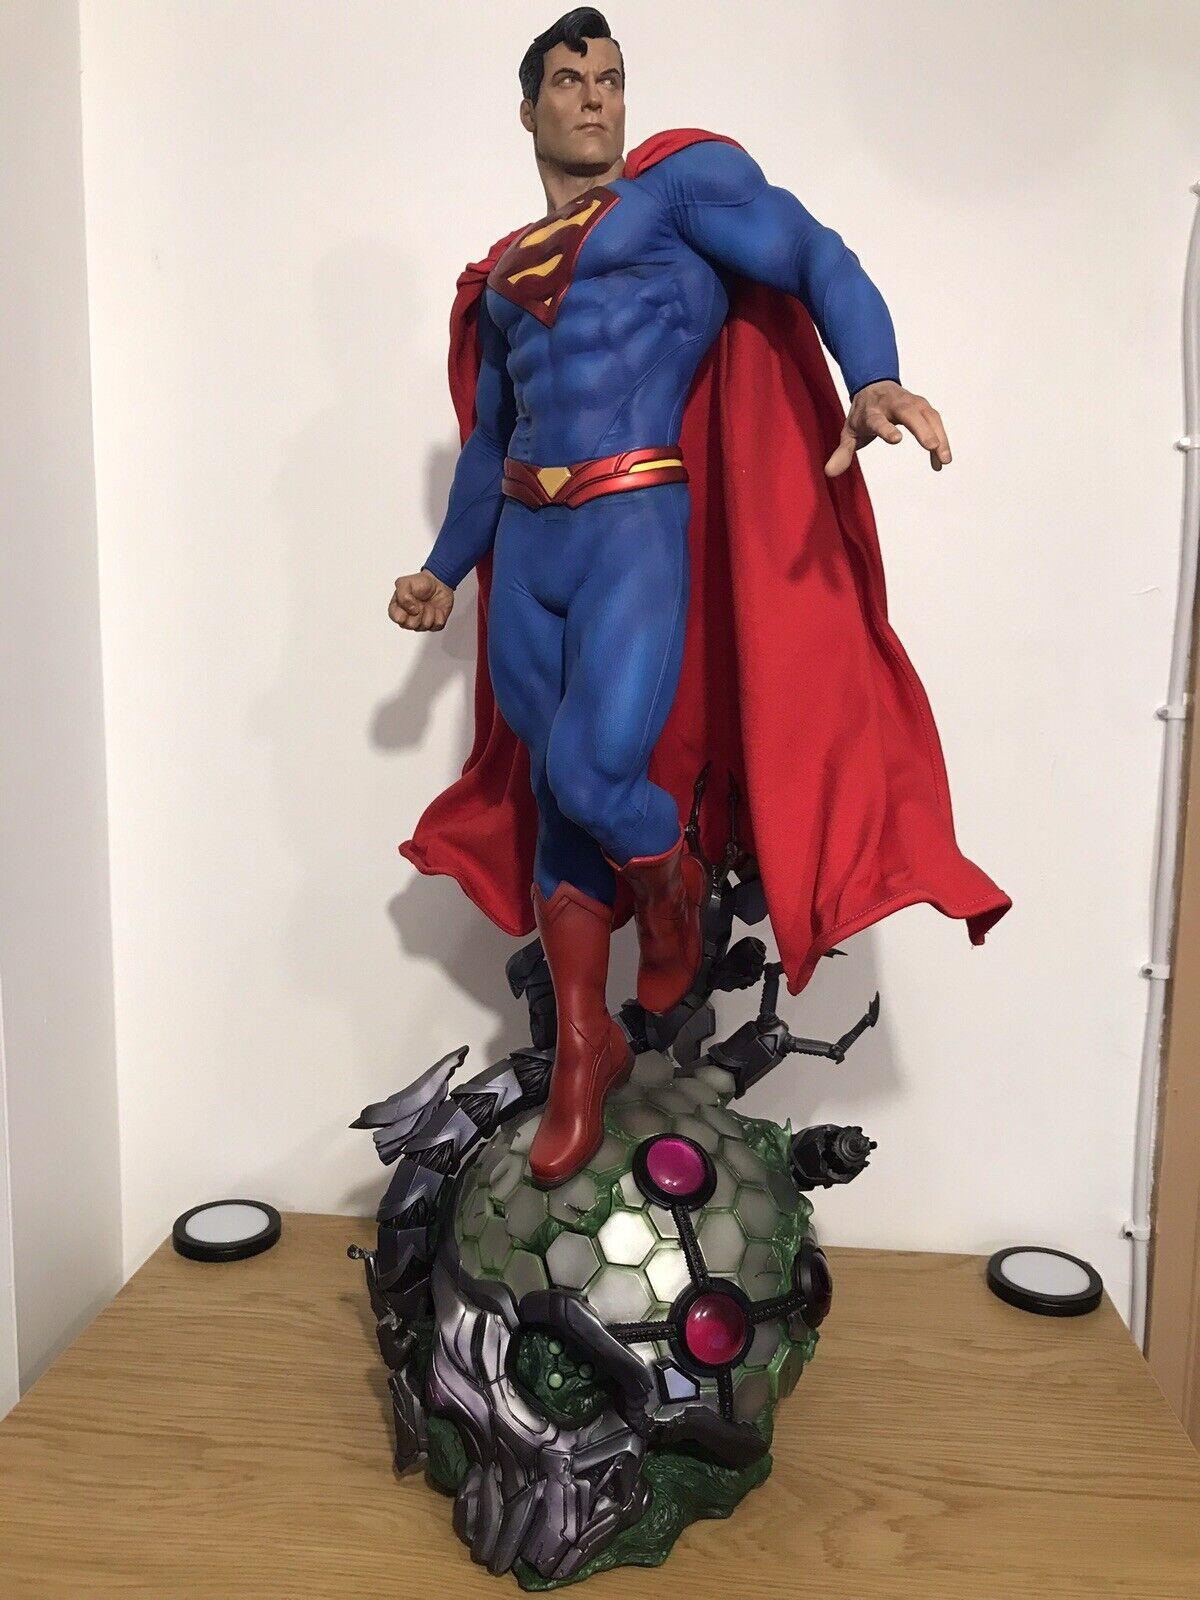 SIDESHOW PREMIUM FORMAT EXCLUSIVE SUPERMAN STATUE